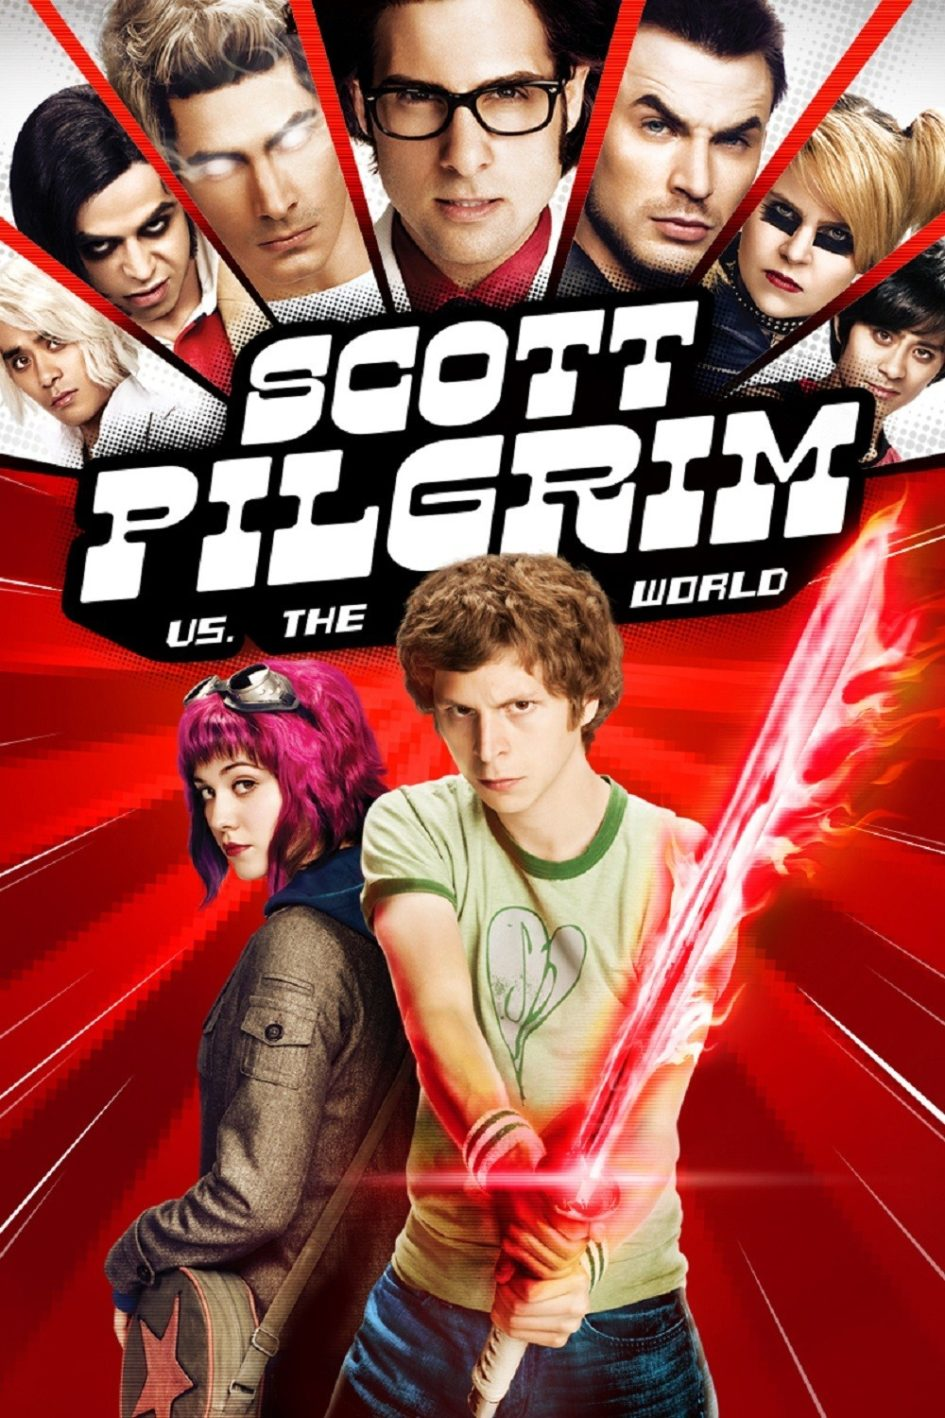 Скотт Пилигрим против всех (2010) - OST